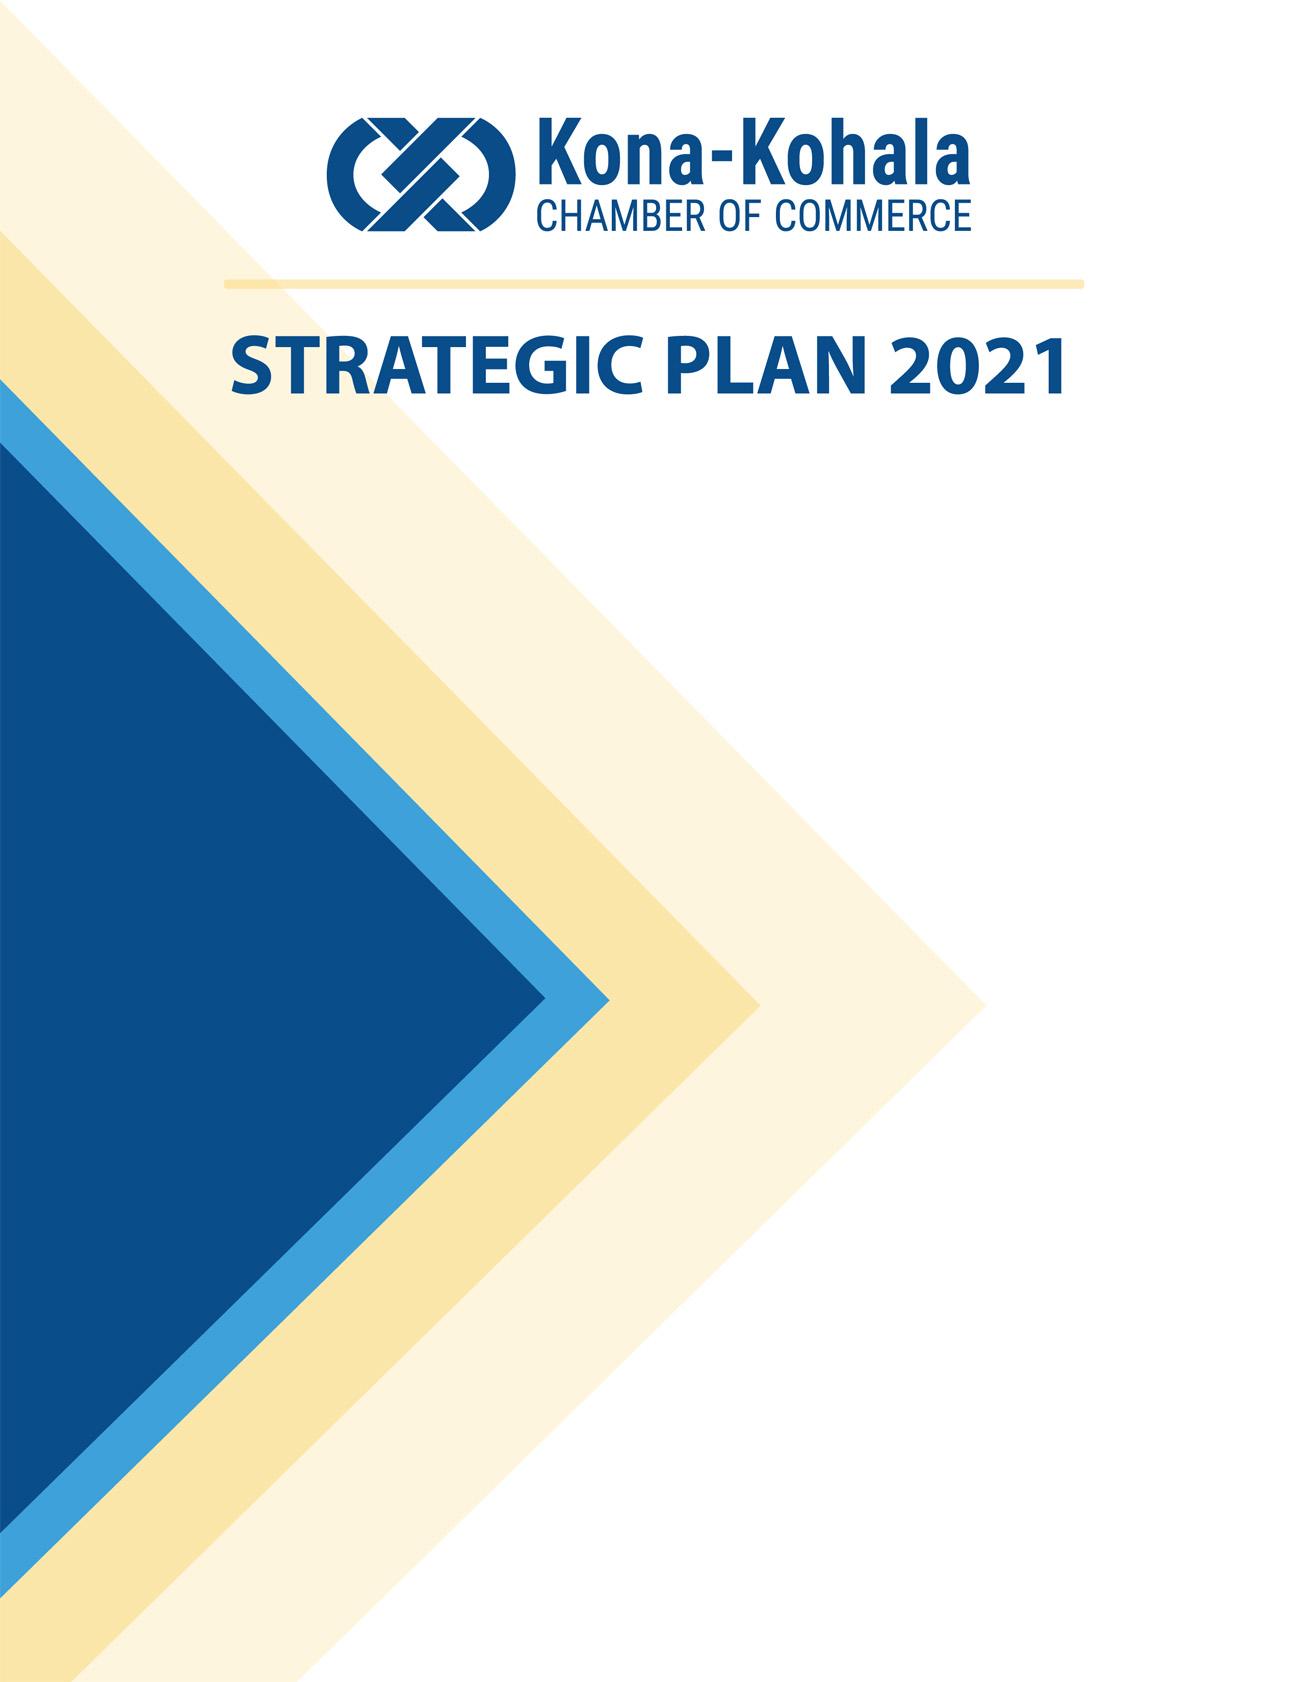 KKCC-Plan-2021-cover.jpg